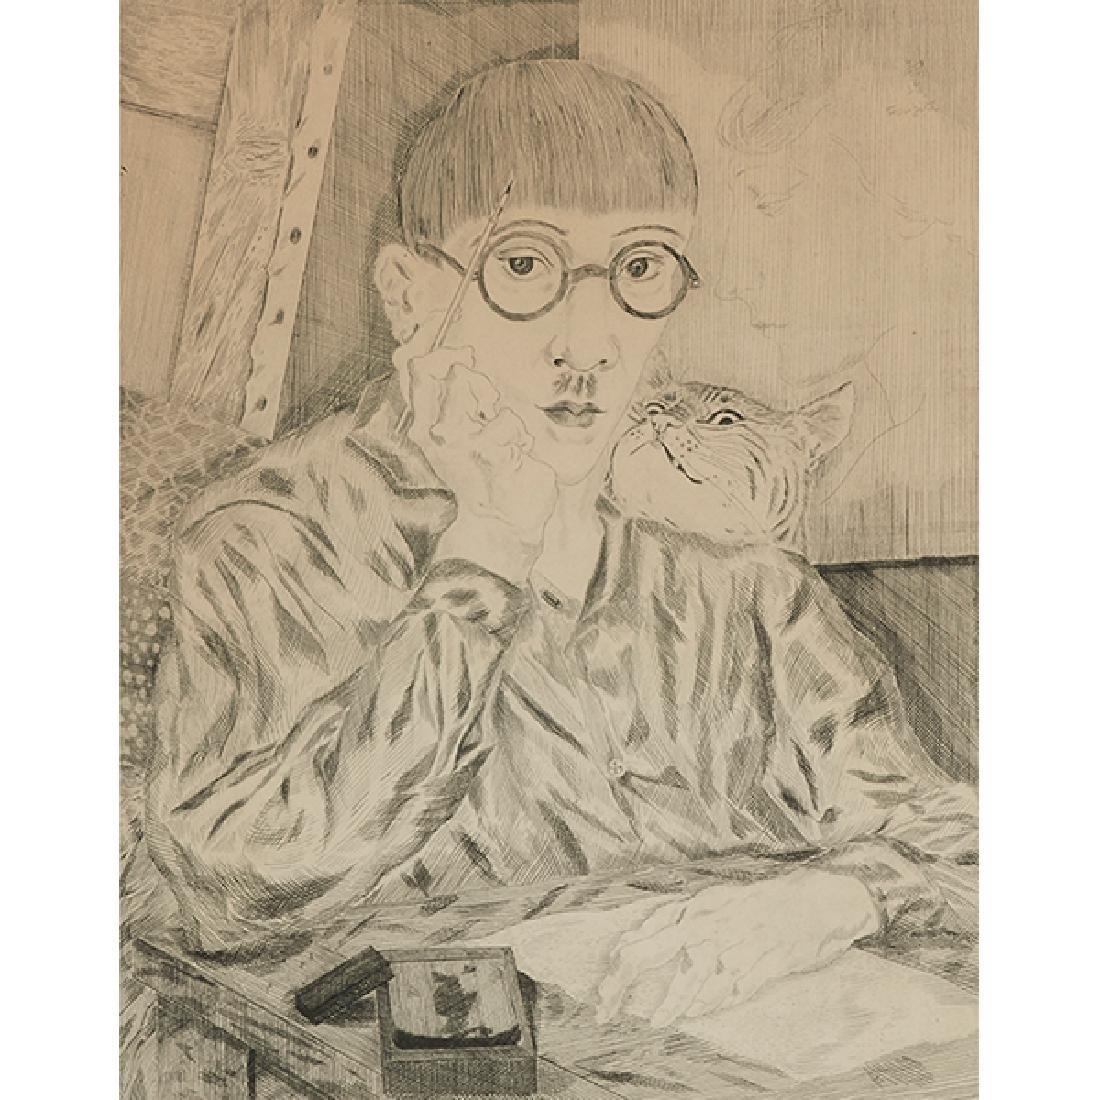 Leonard Foujita, (French/Japanese, 1886-1968), Self